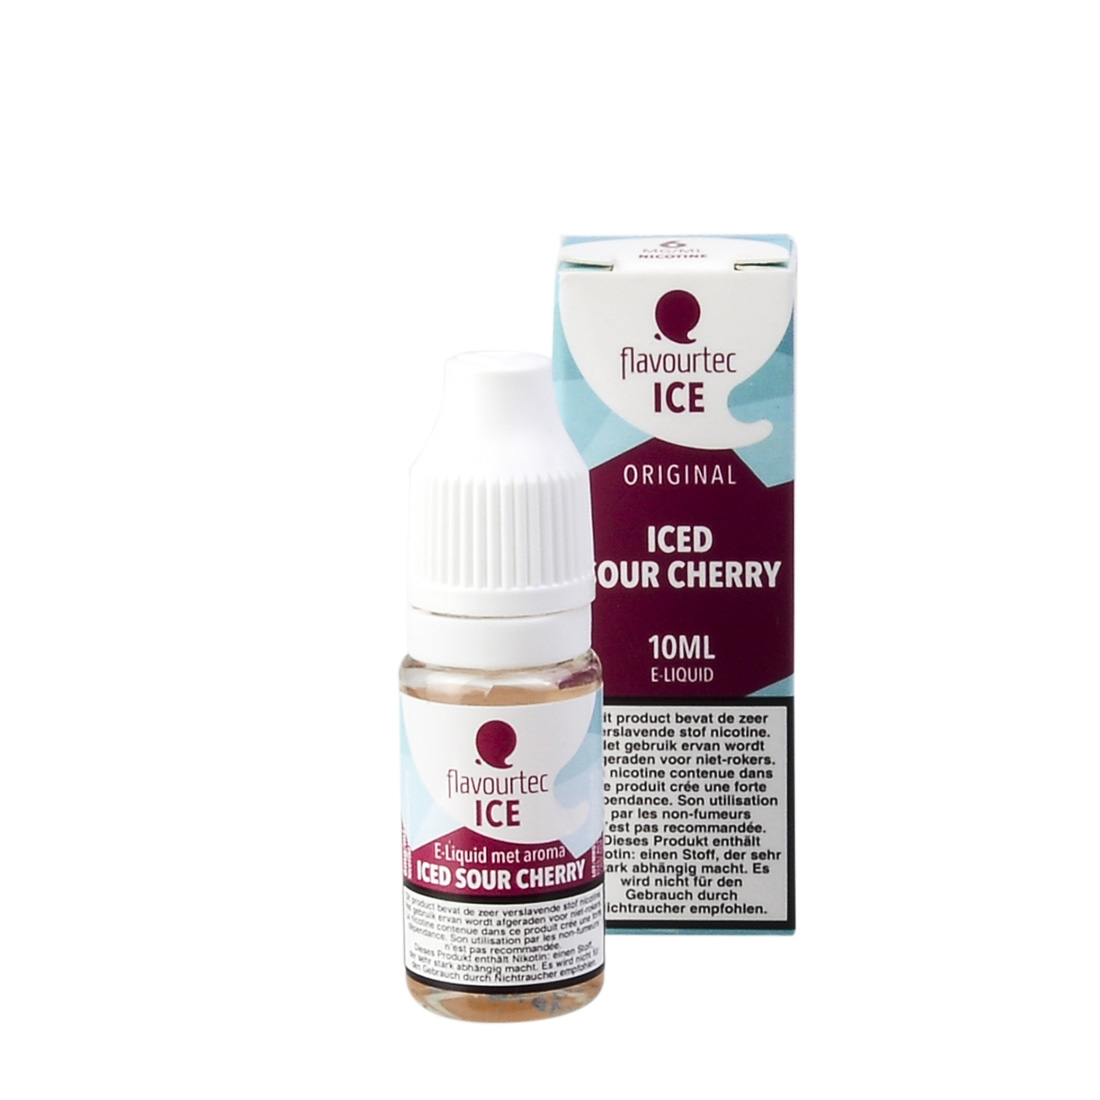 E-LIQUIDE FLAVOURTEC ICED SOUR CHERRY